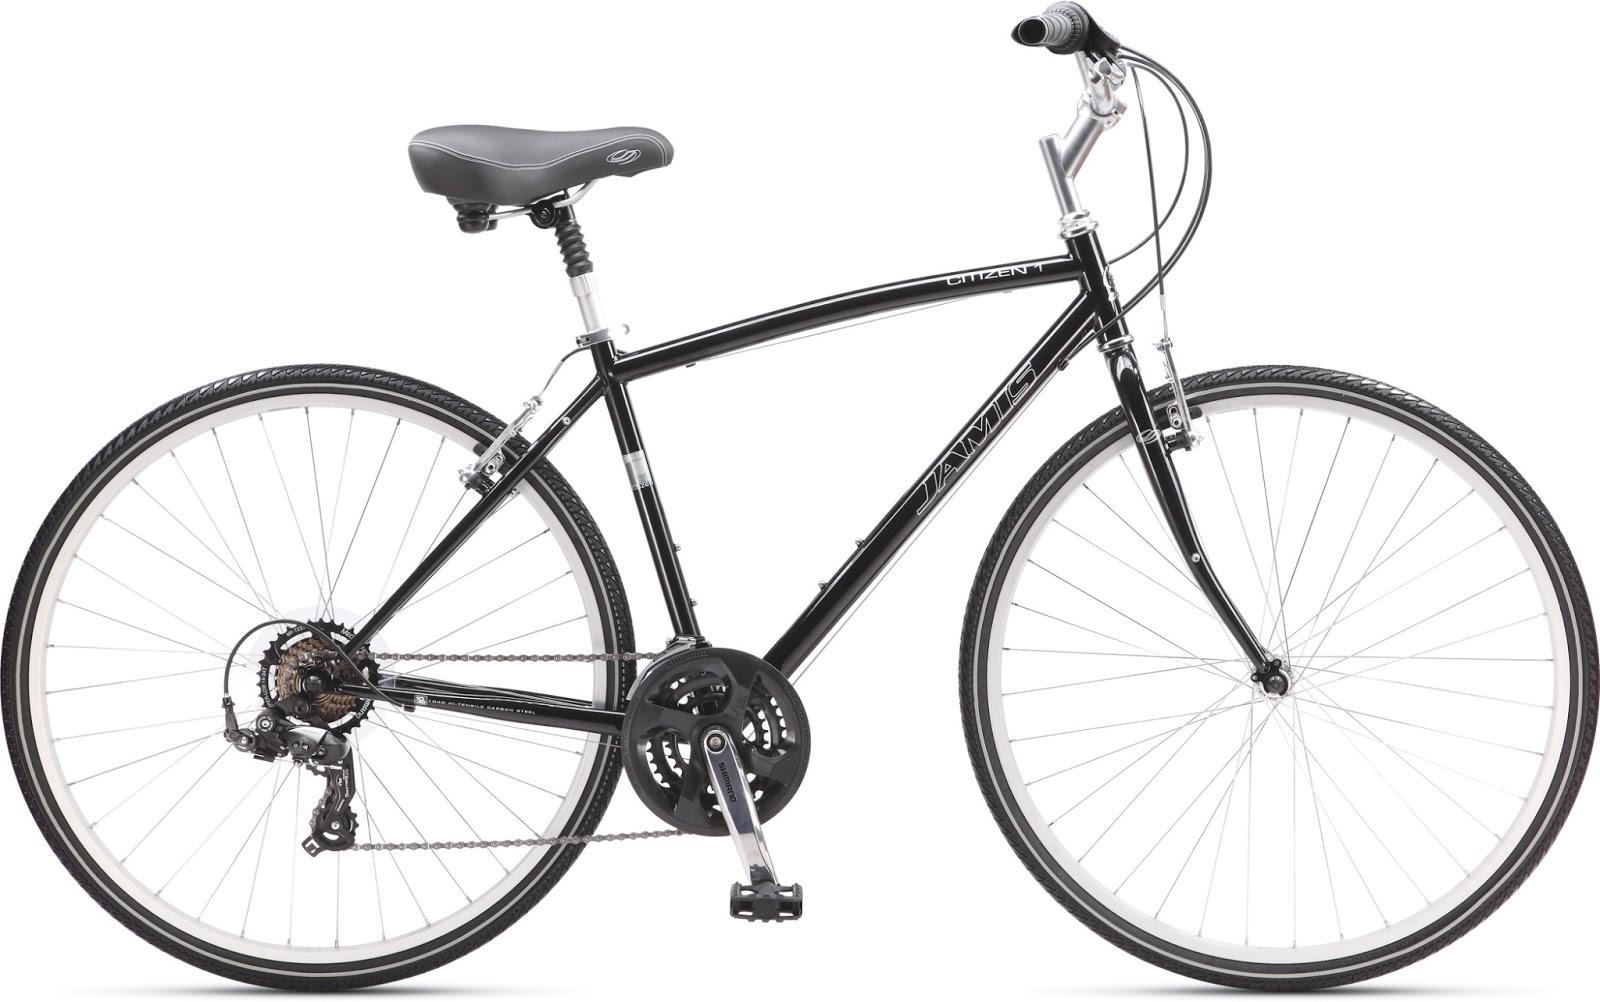 Bikes Citizen Hybrid Janis A basic hybrid bike from Jamis